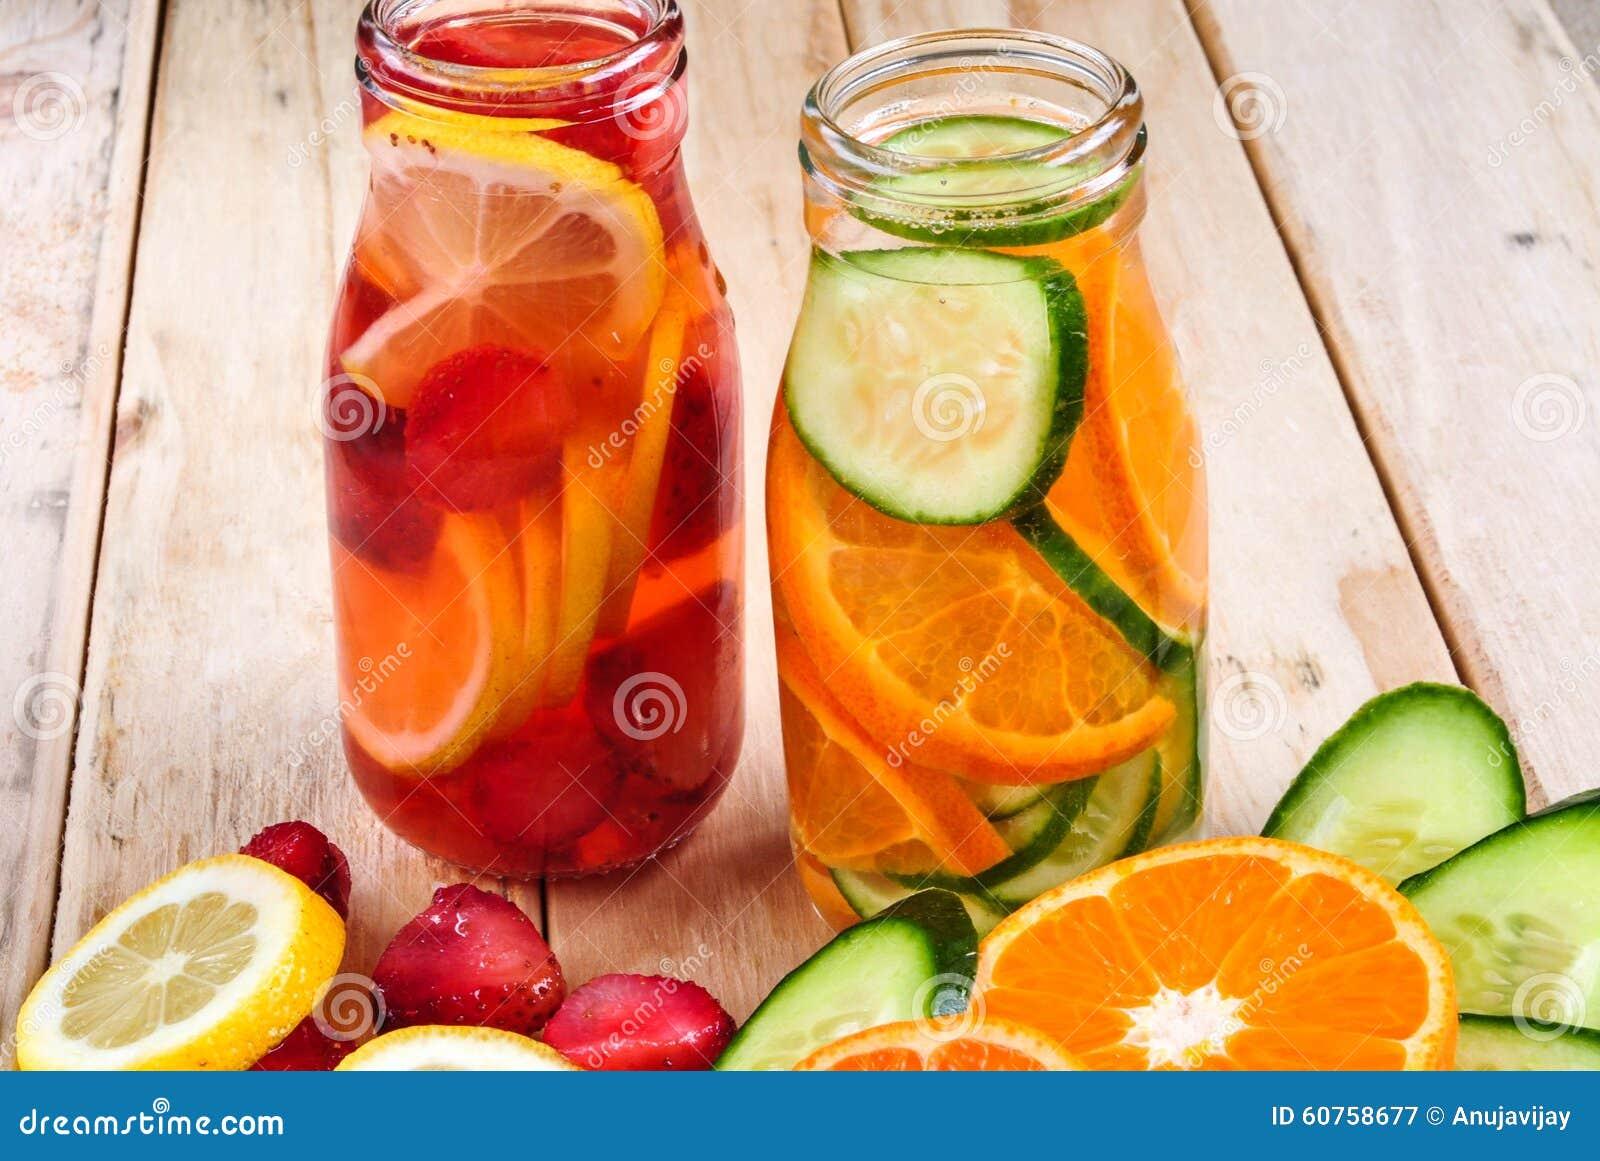 Fruit water with strawberry, lemon, cucumber, orange.